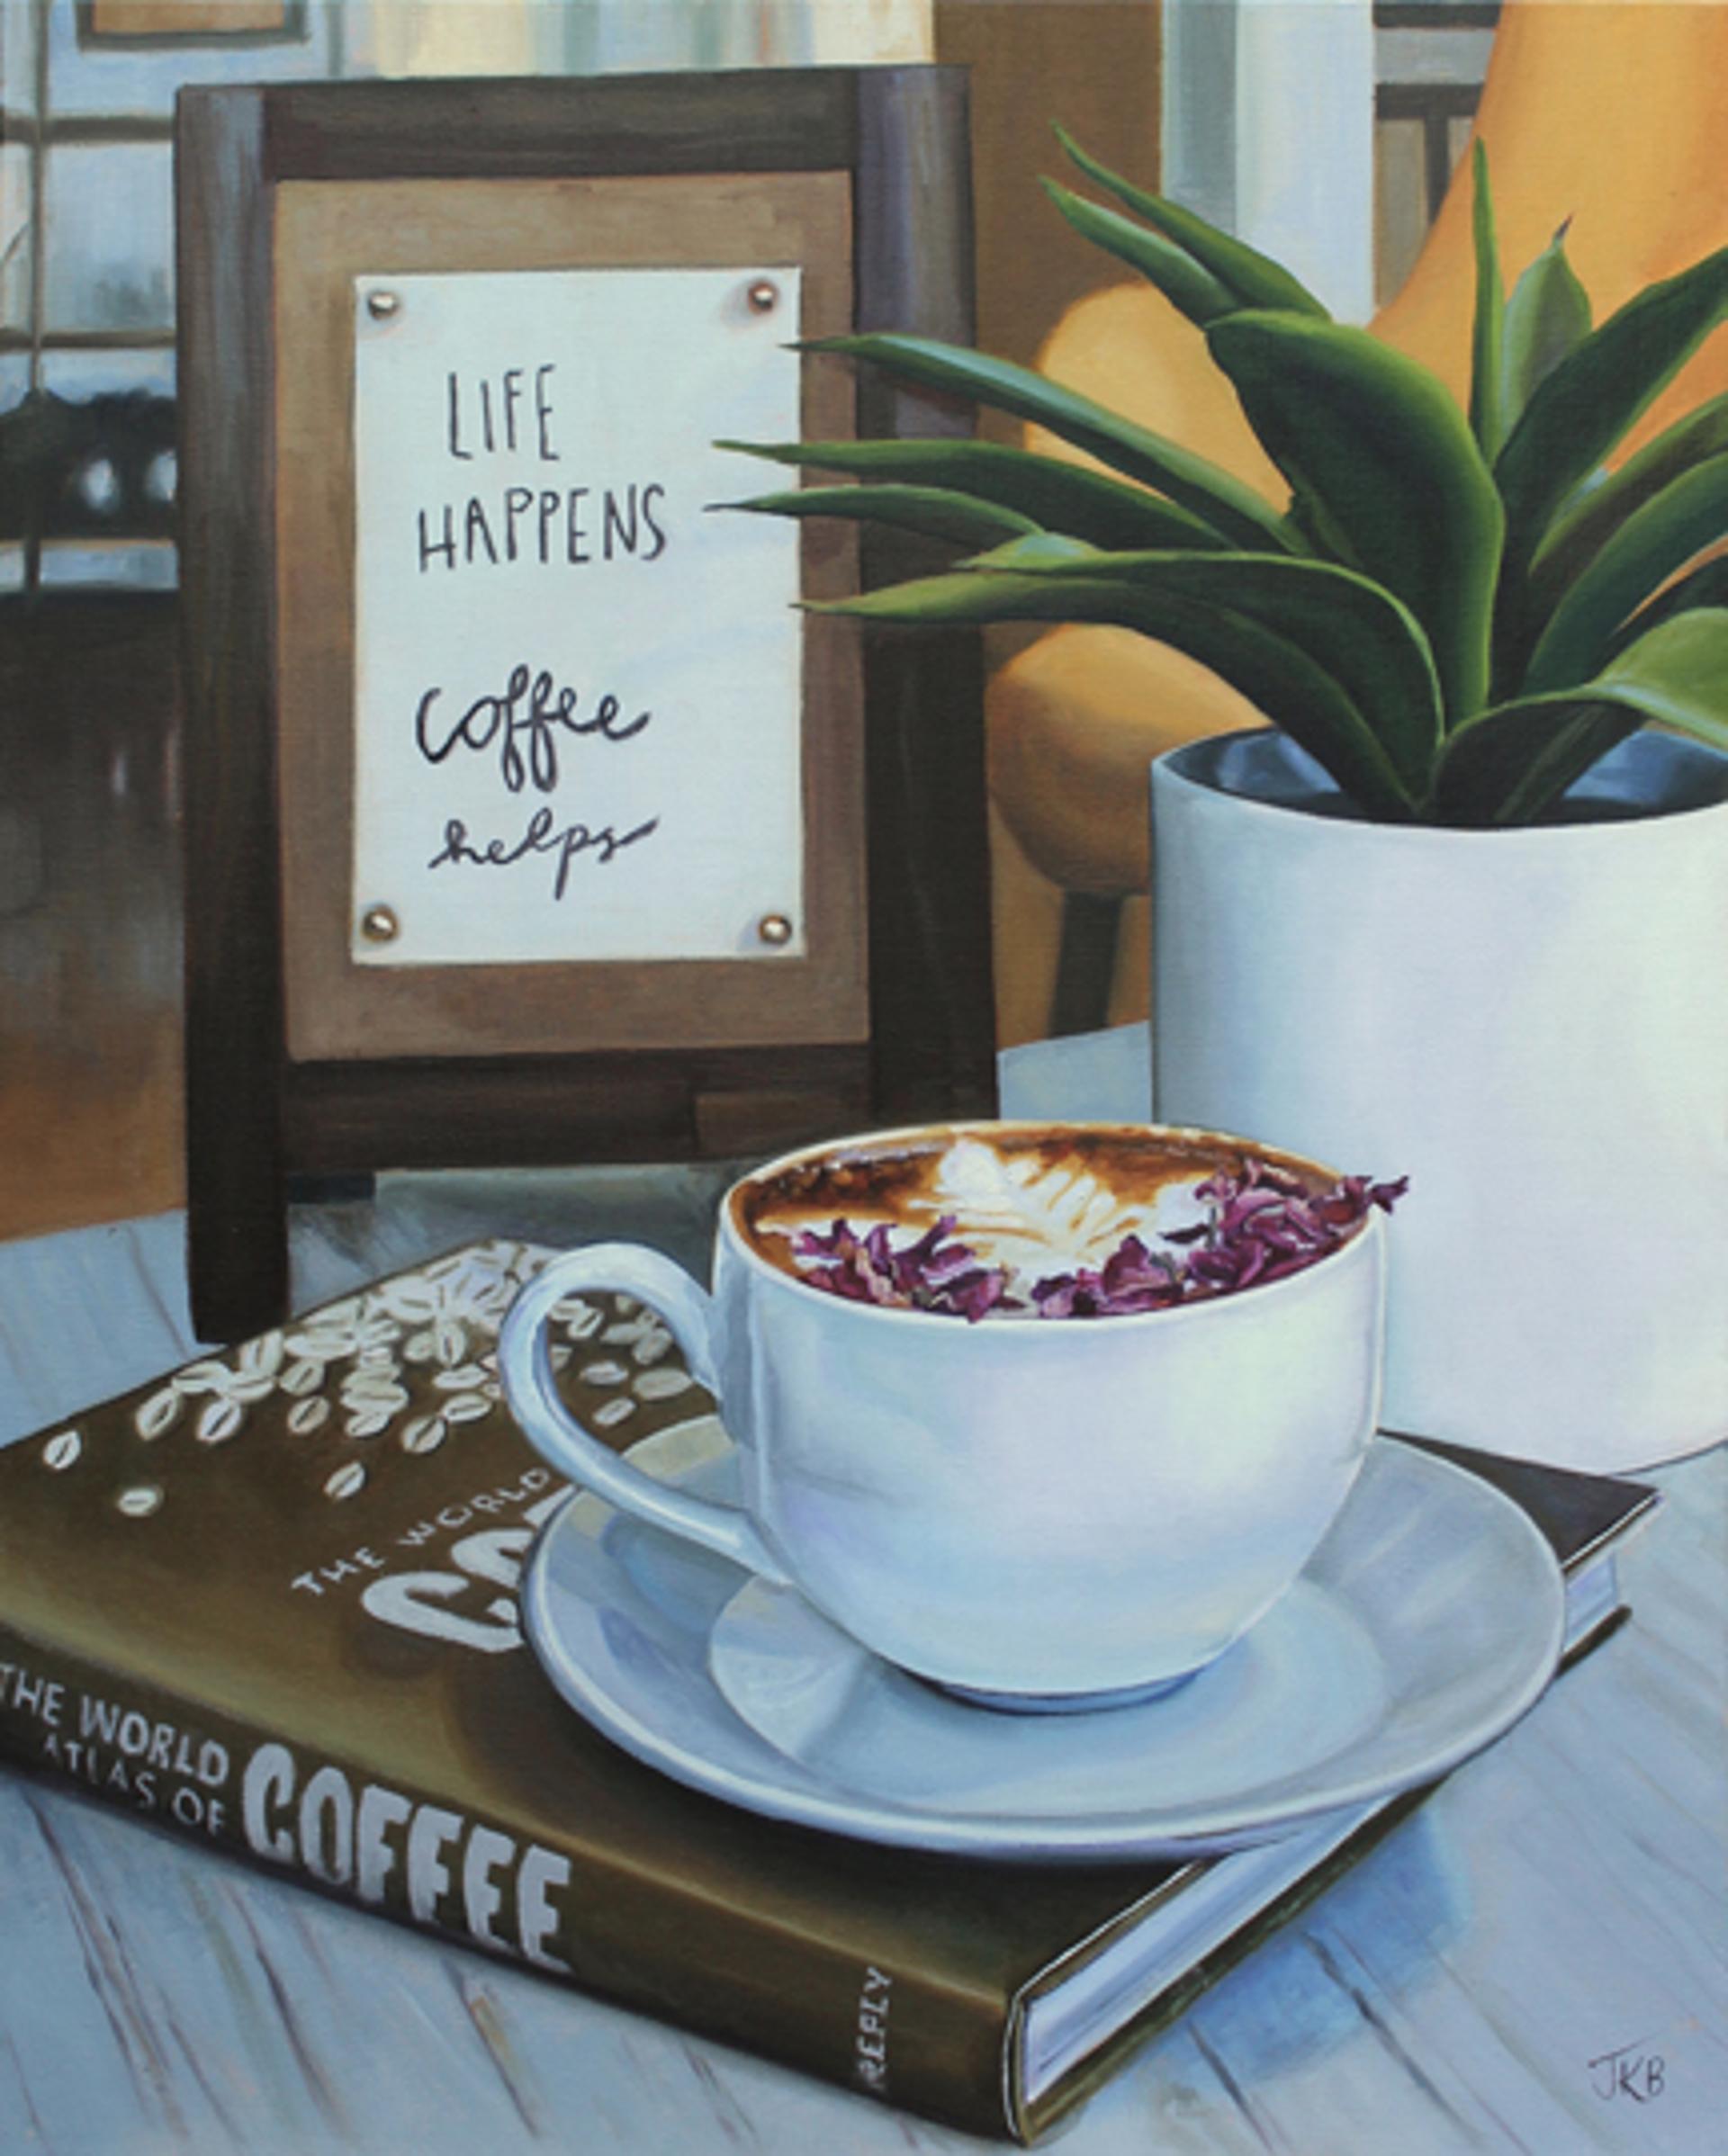 Life Happens Coffee Helps by Jennifer Barlow